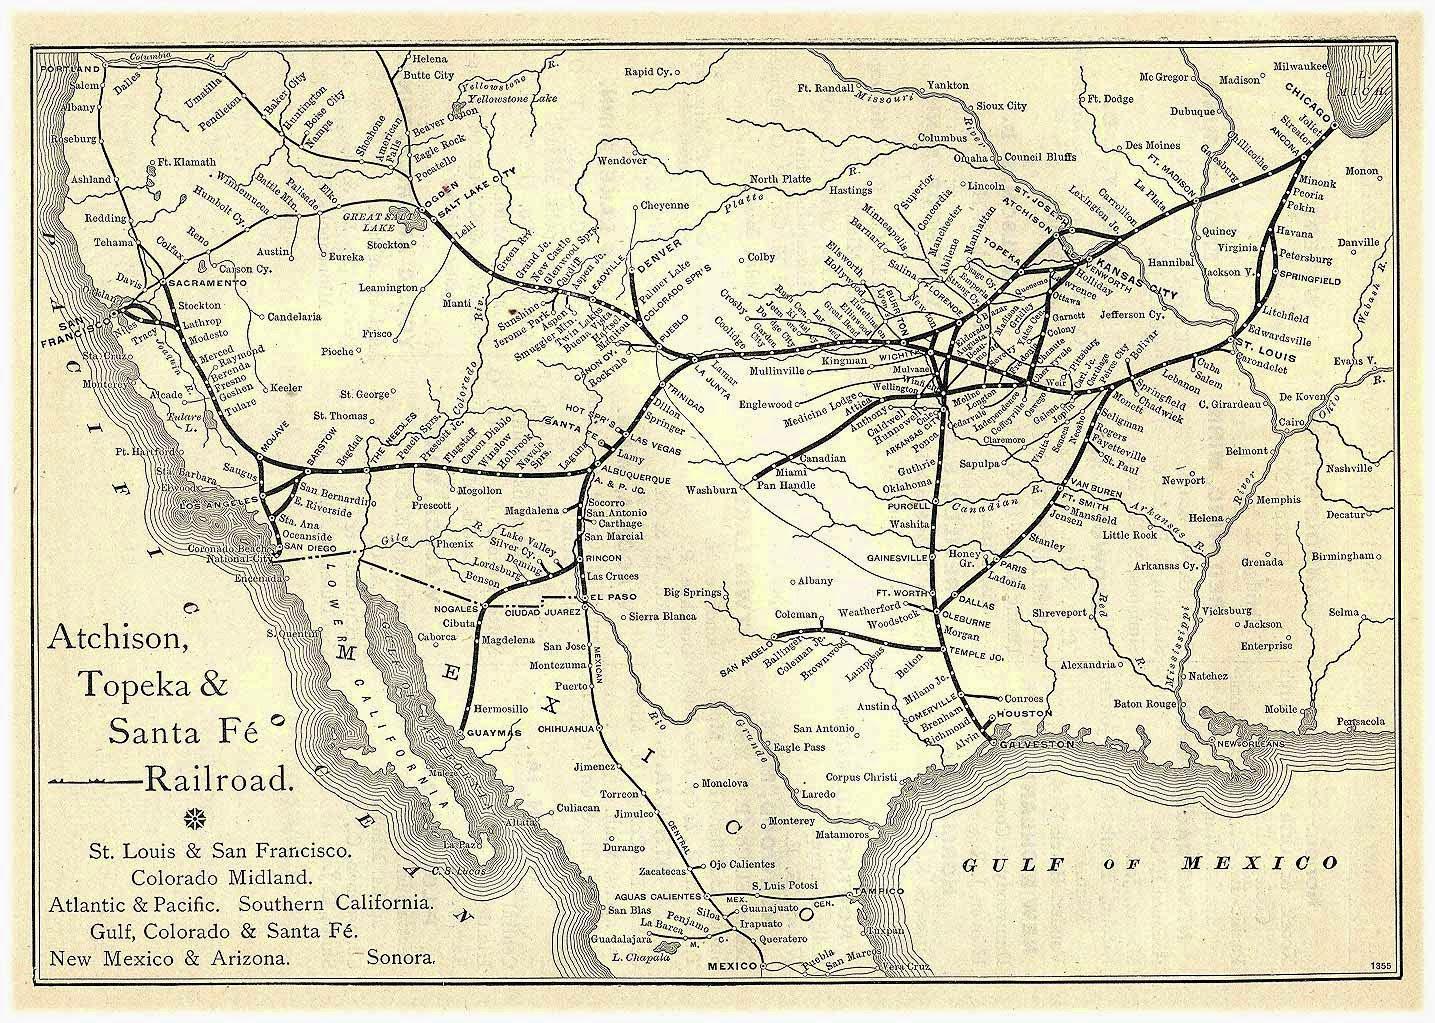 atchison topeka and santa fe railway